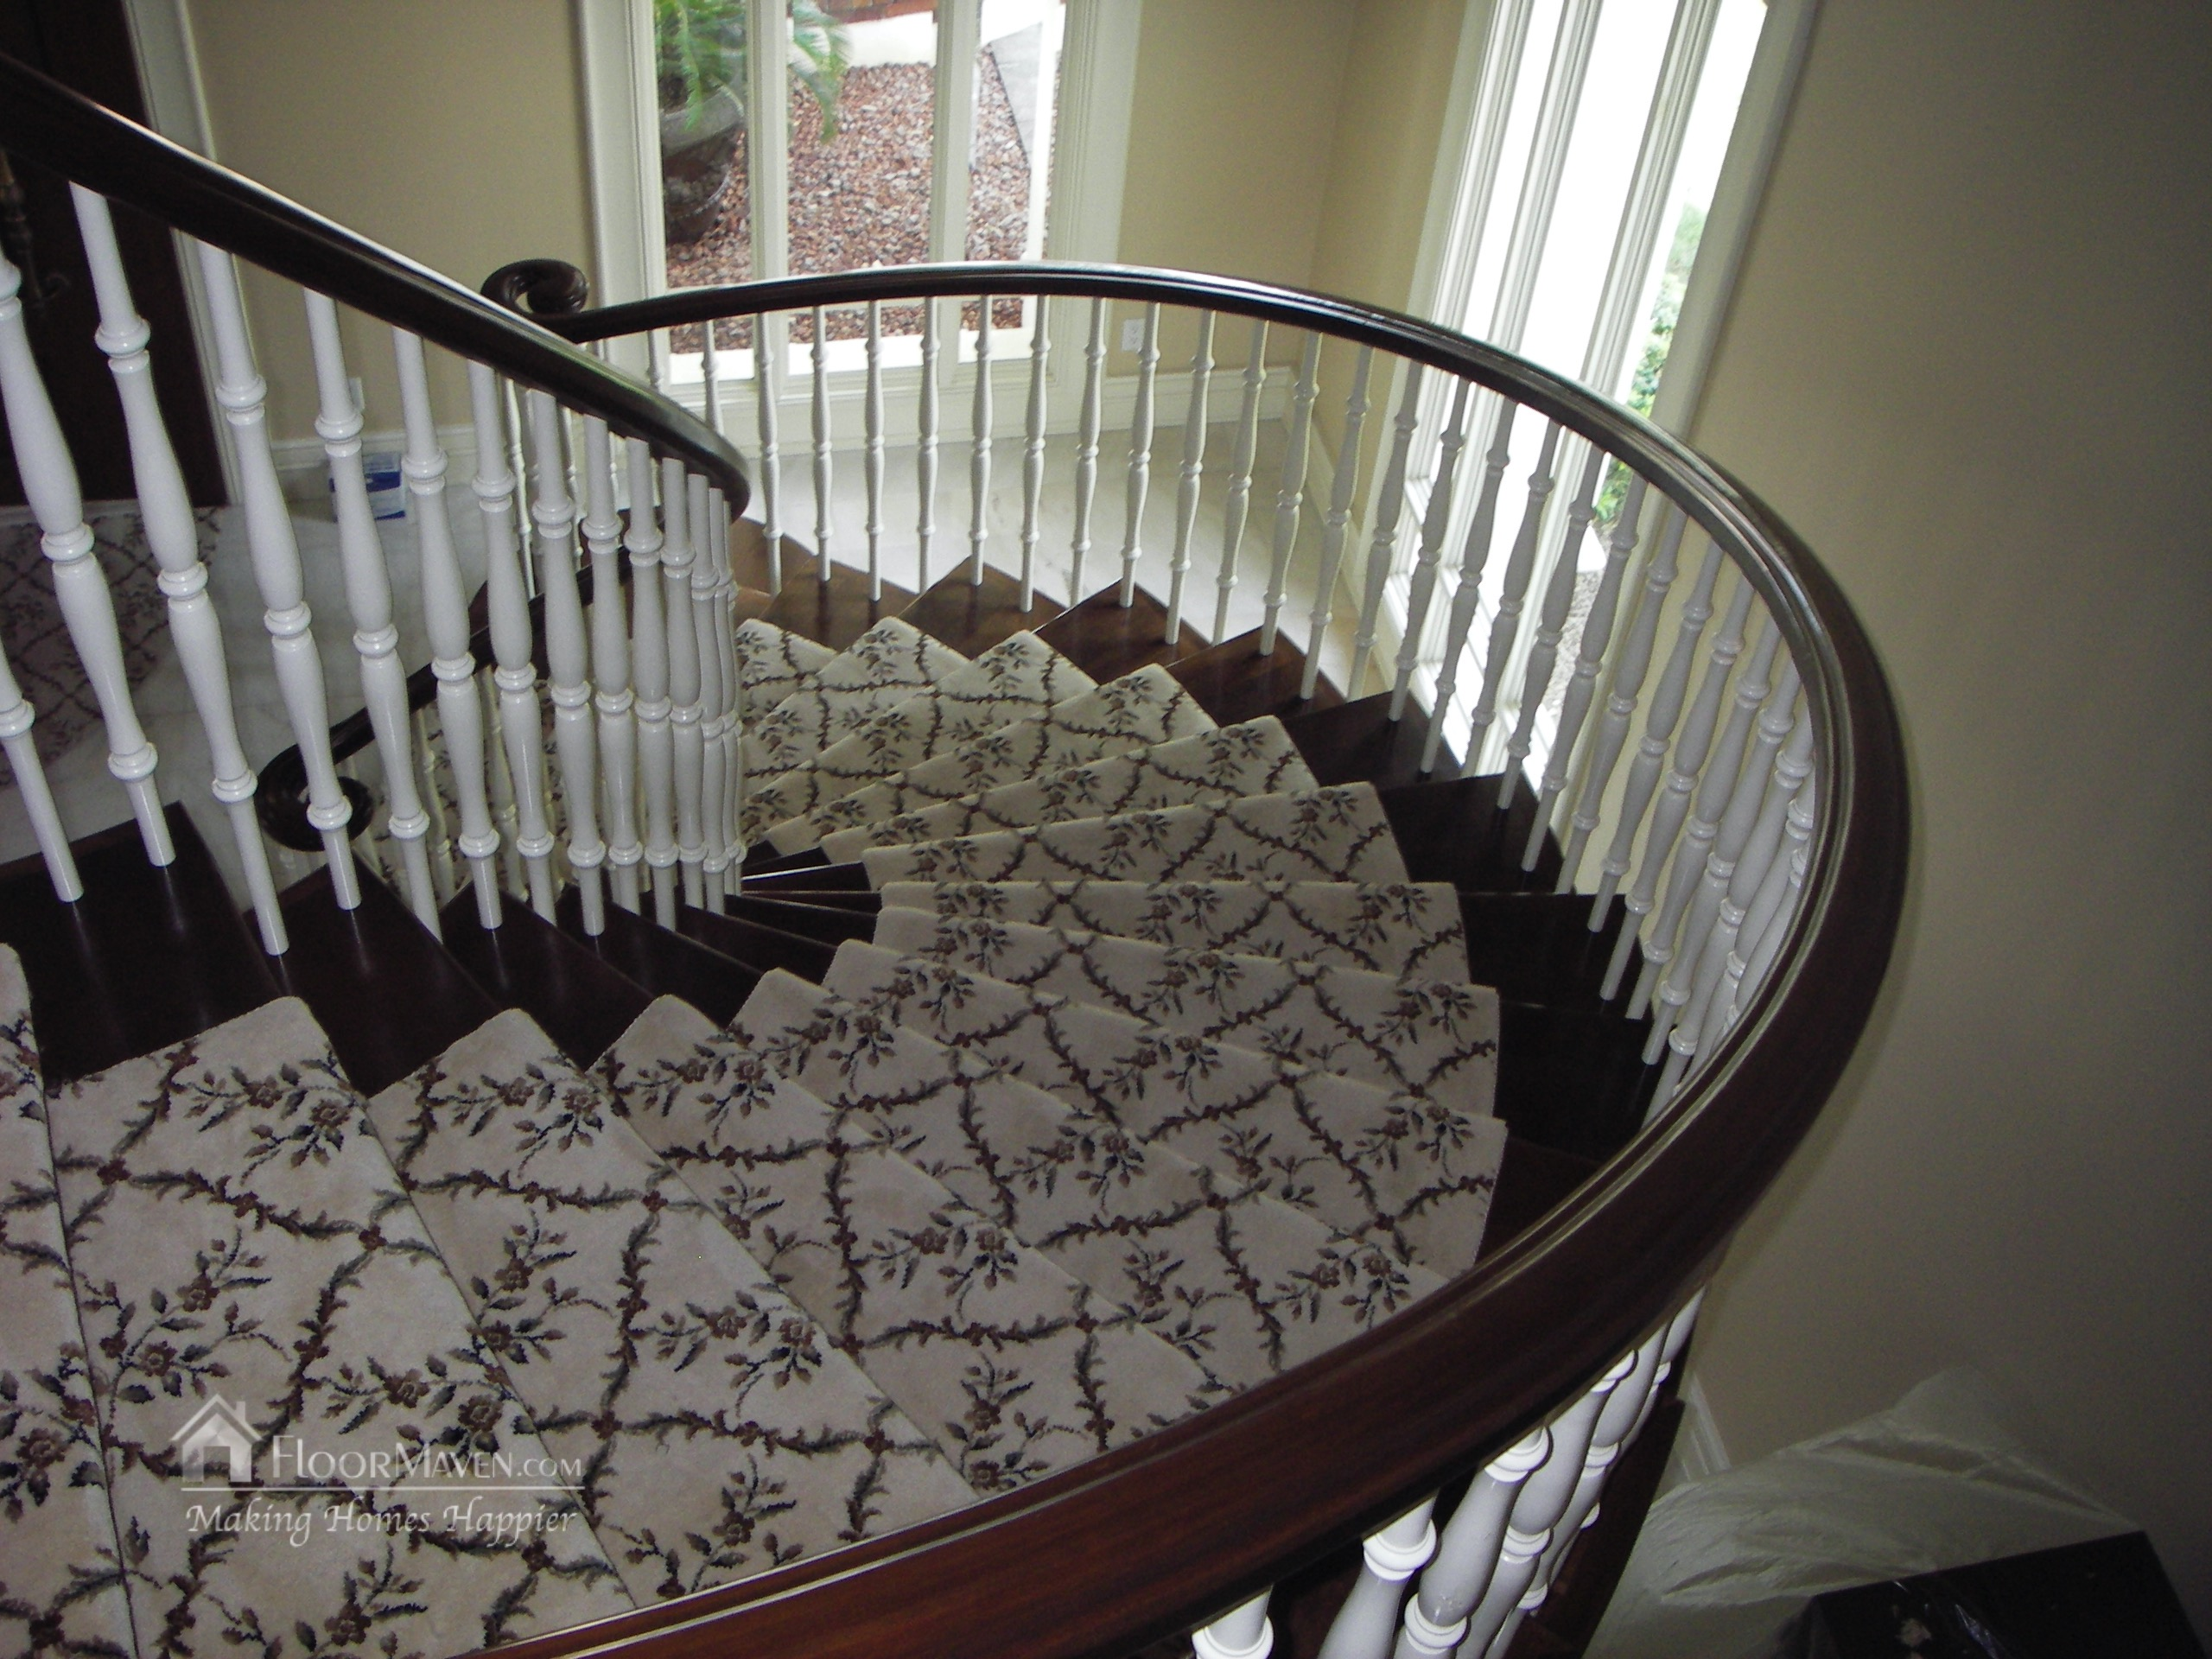 Carpet Runner in Biltmore Estates by FloorMaven.com